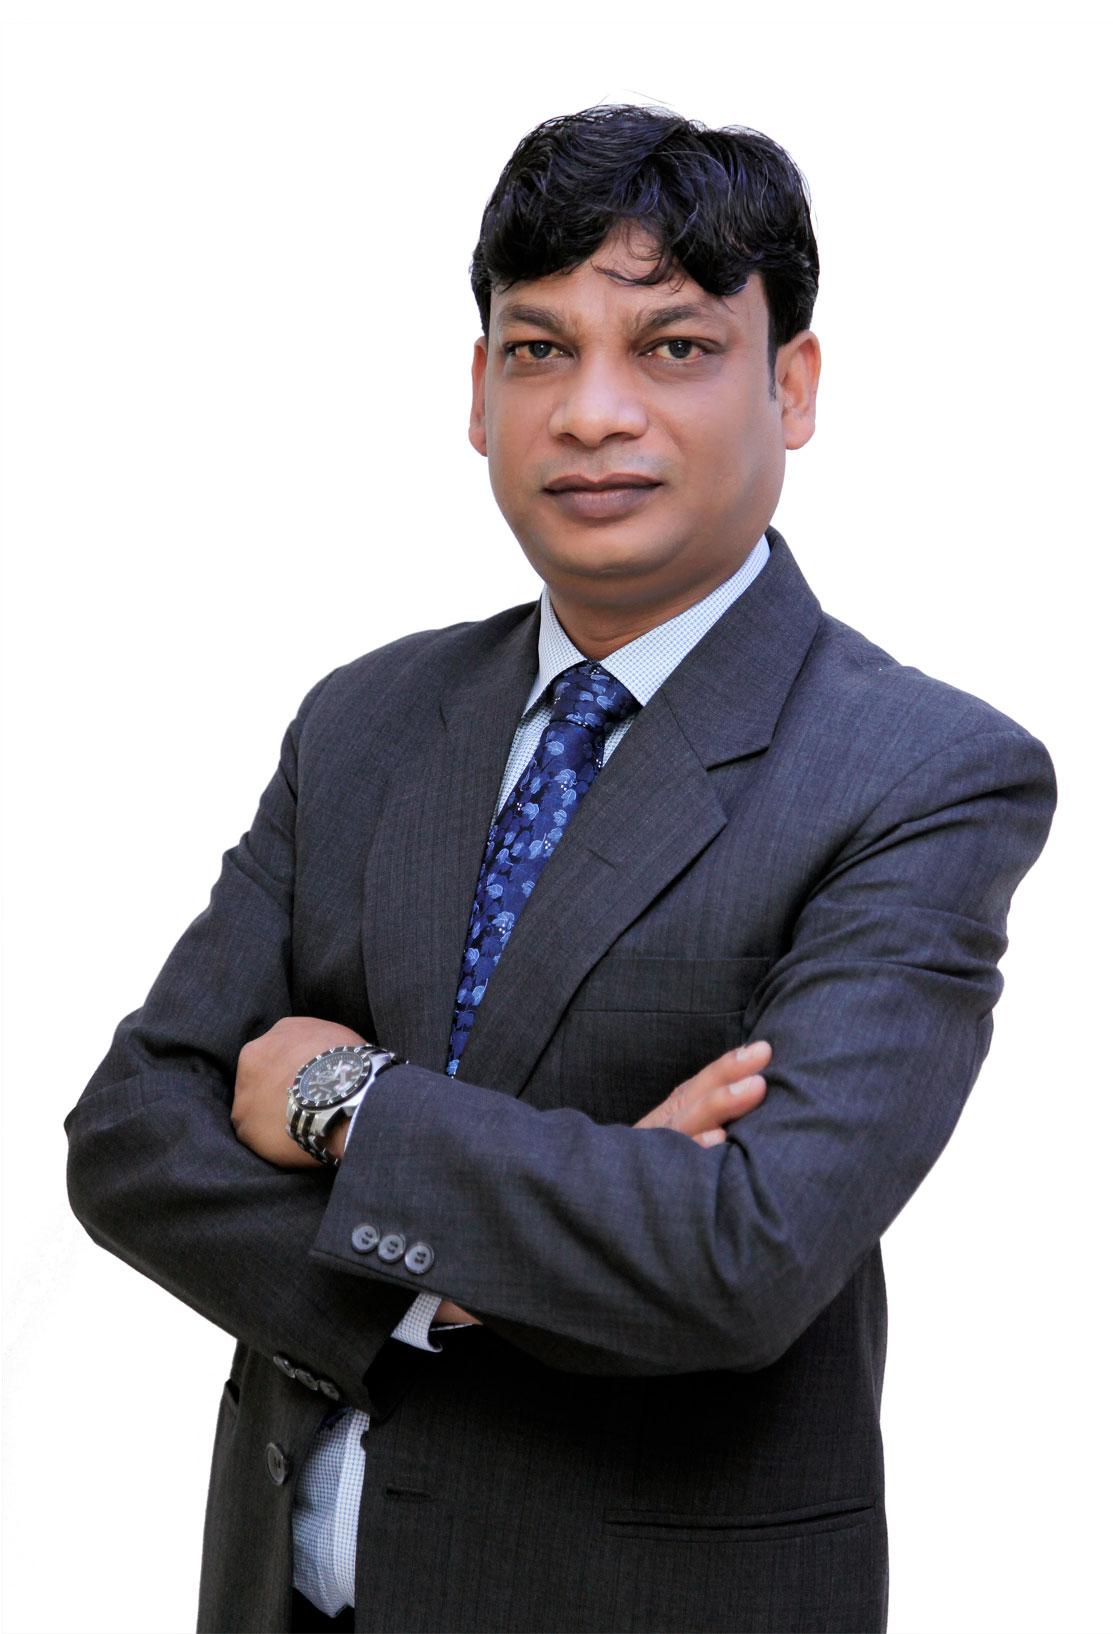 https://mgmmedical.ae/wp-content/uploads/2018/04/Dr-Rajeev-Garg.jpg